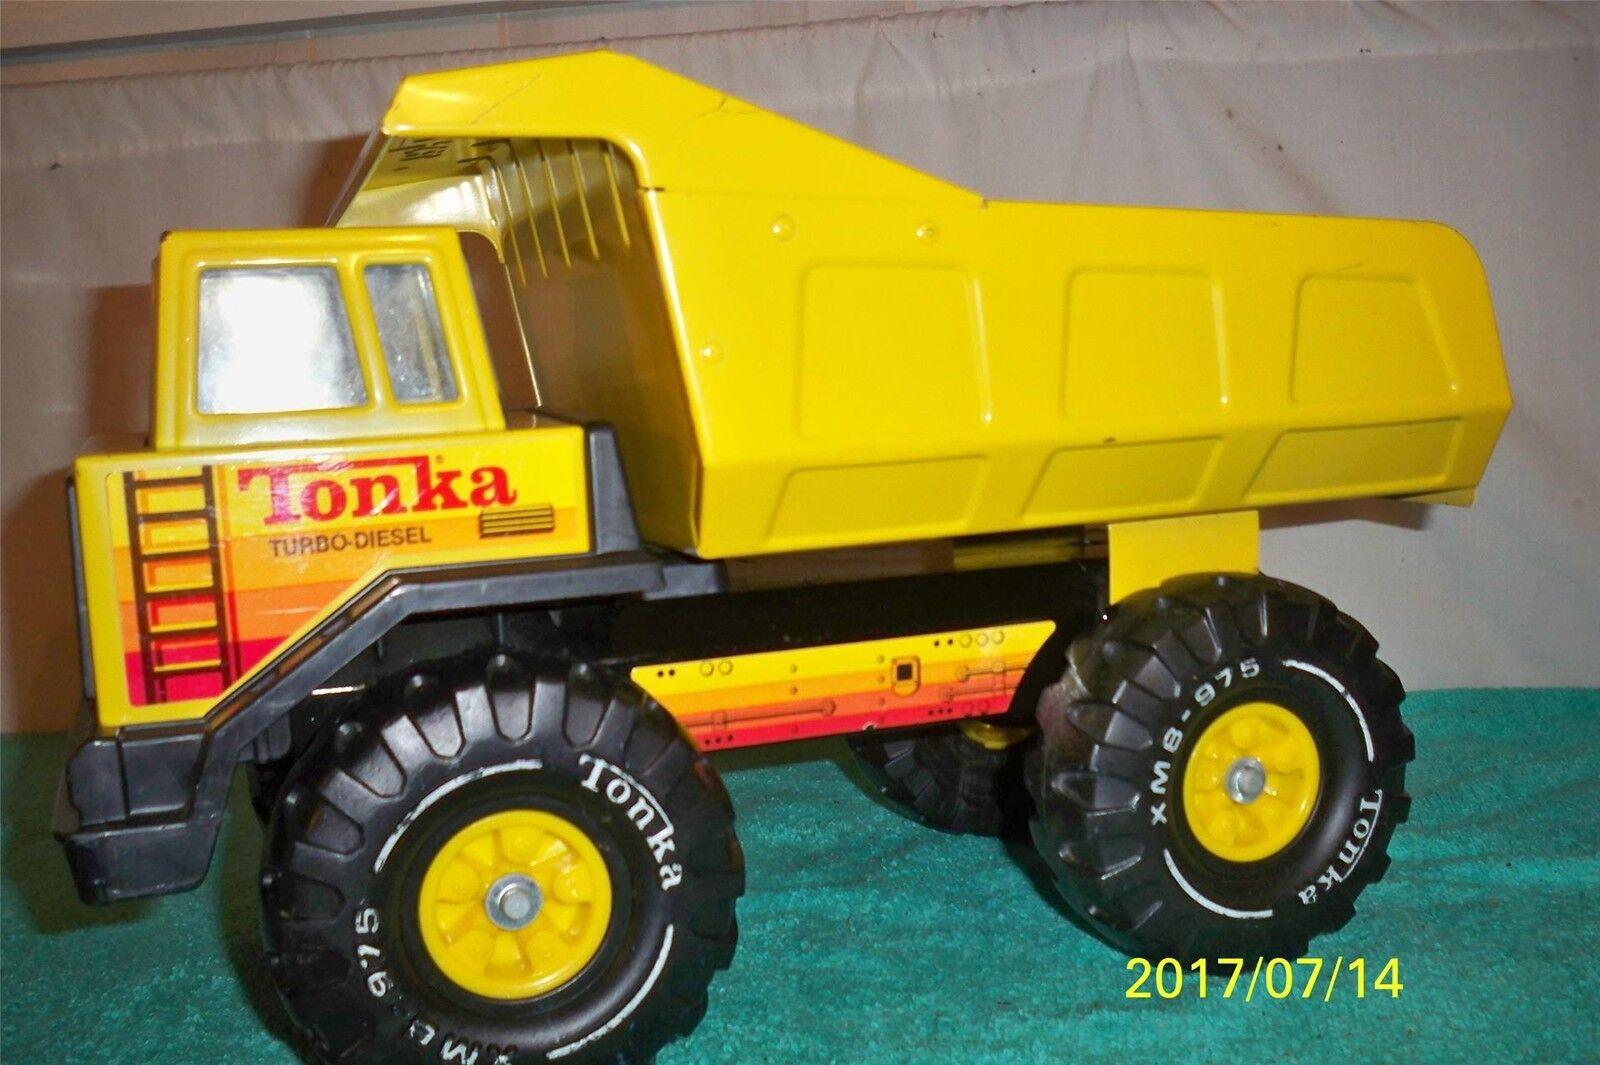 TONKA Mighty turbo diesel 1984 Good Mighty camion benne Pressé Acier 16 3 4  long